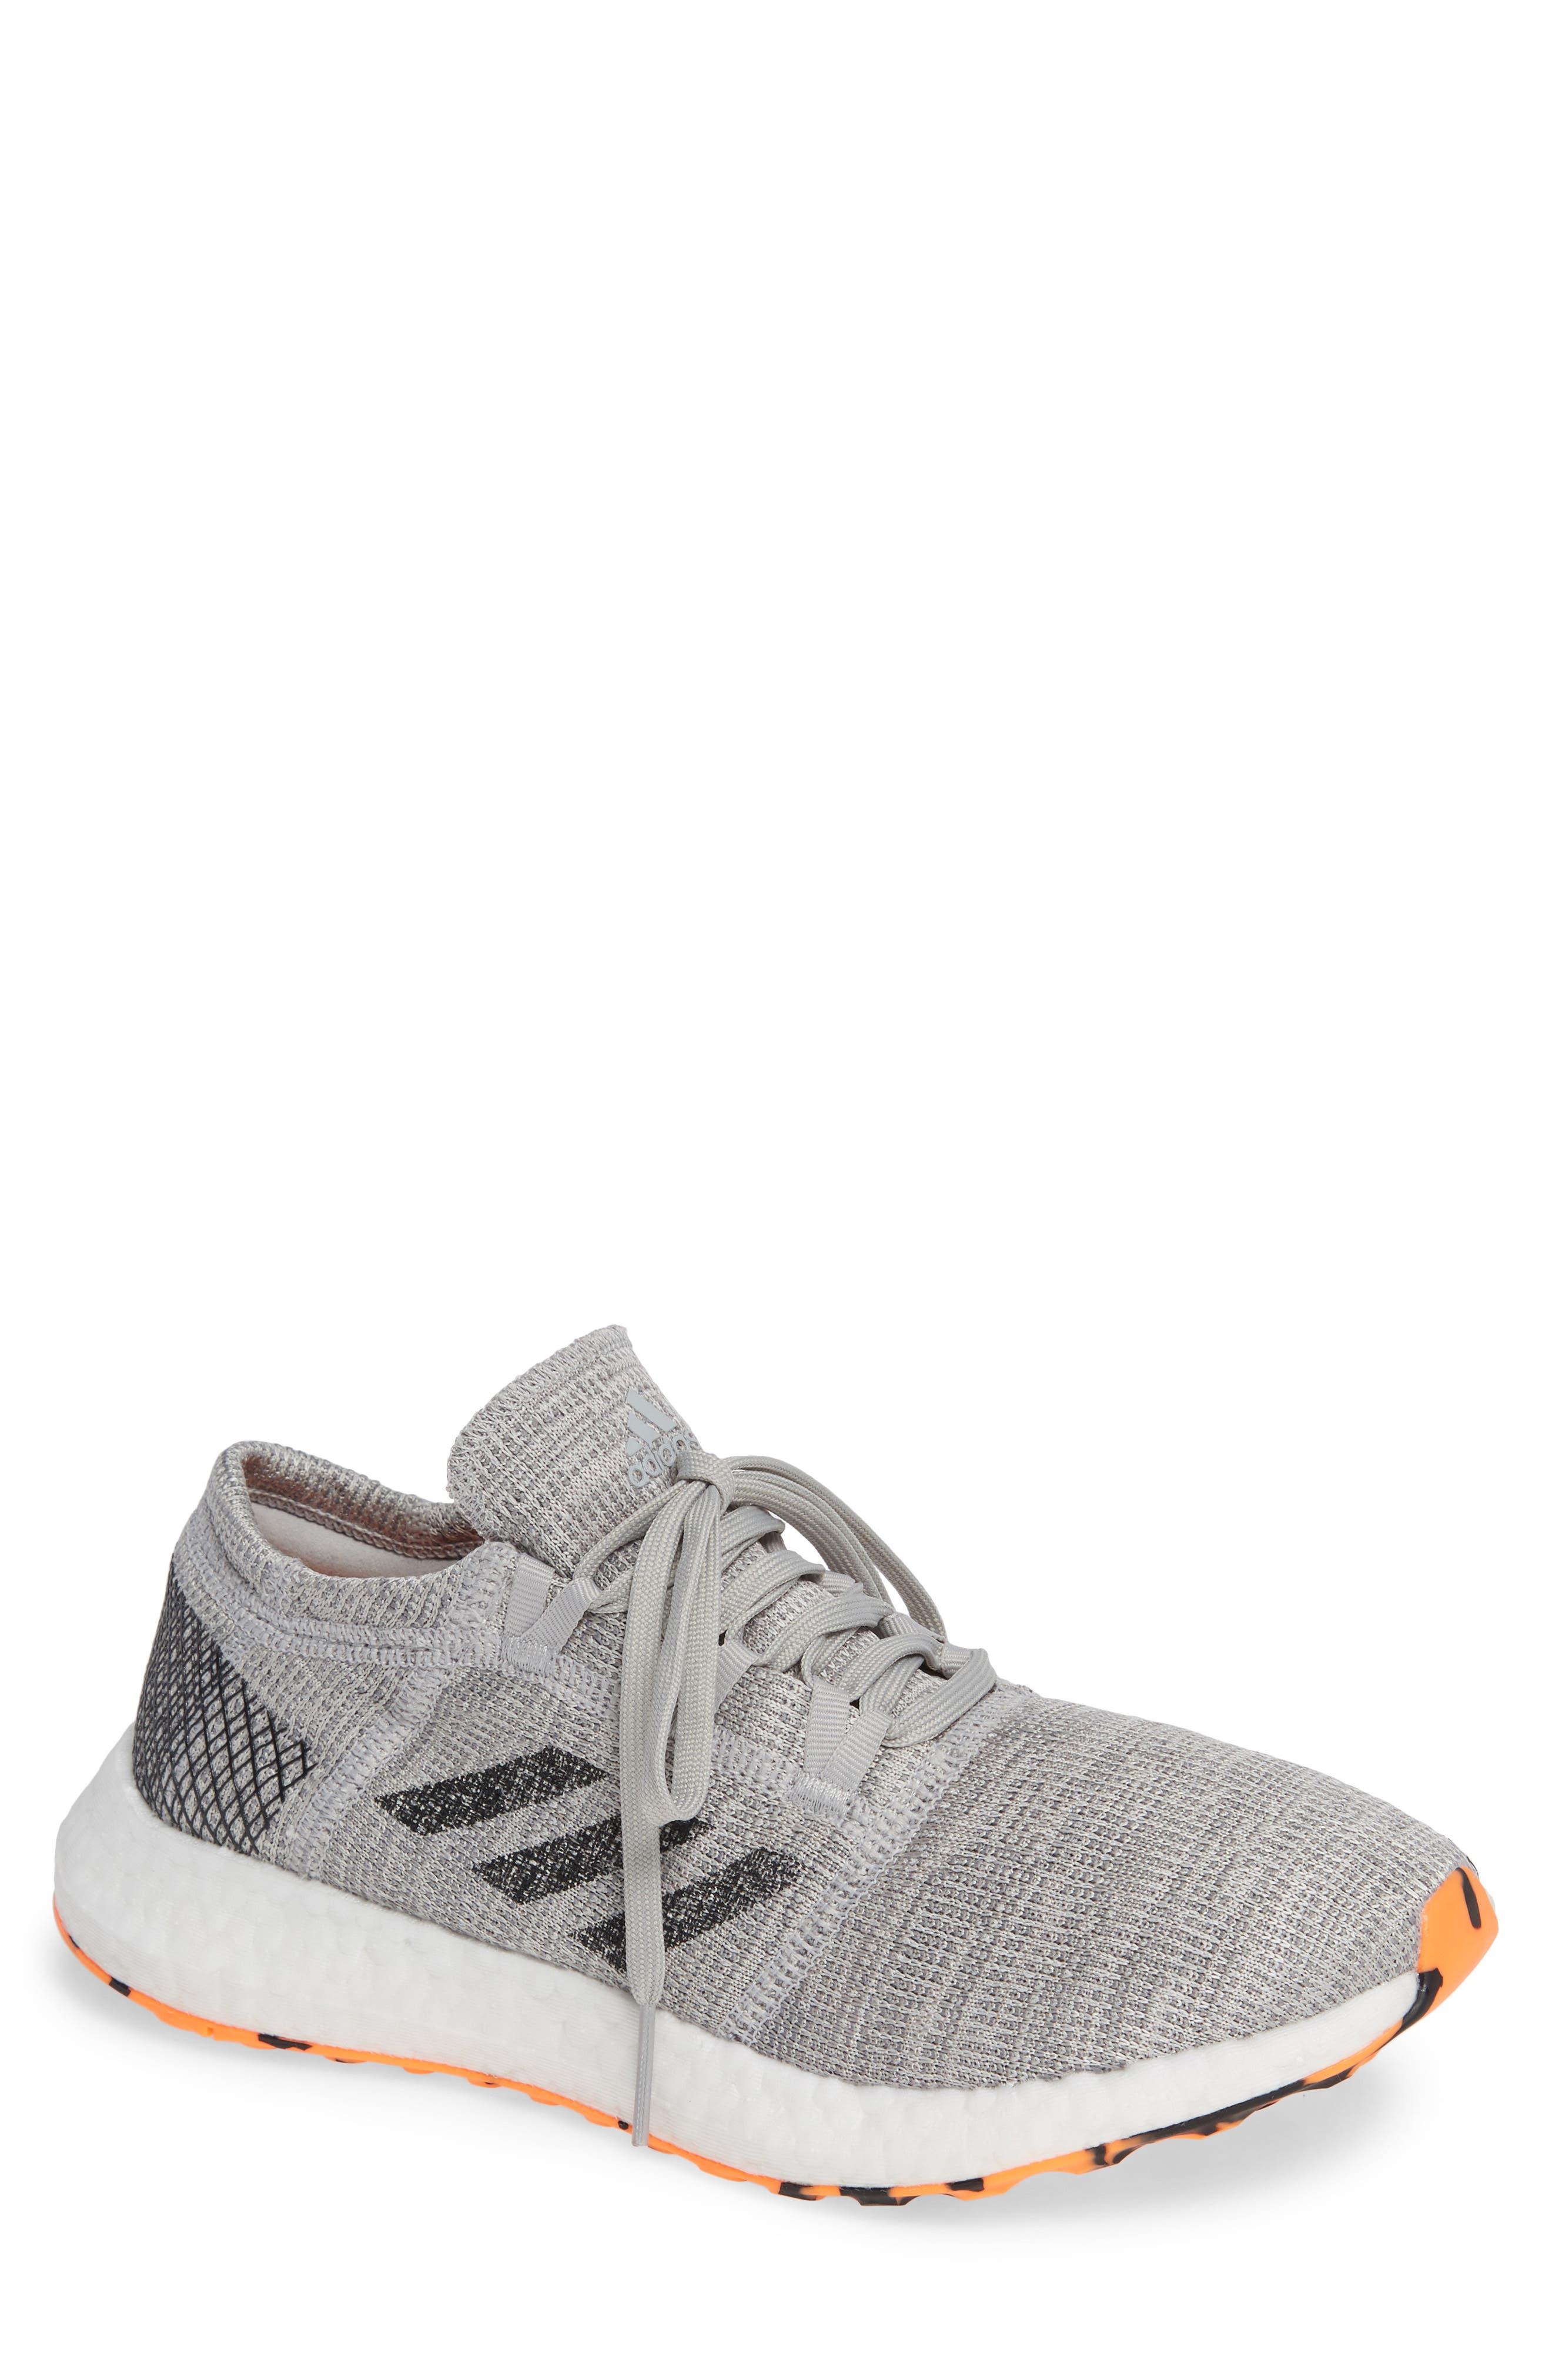 PureBoost GO Running Shoe,                         Main,                         color, GREY/ BLACK/ ORANGE